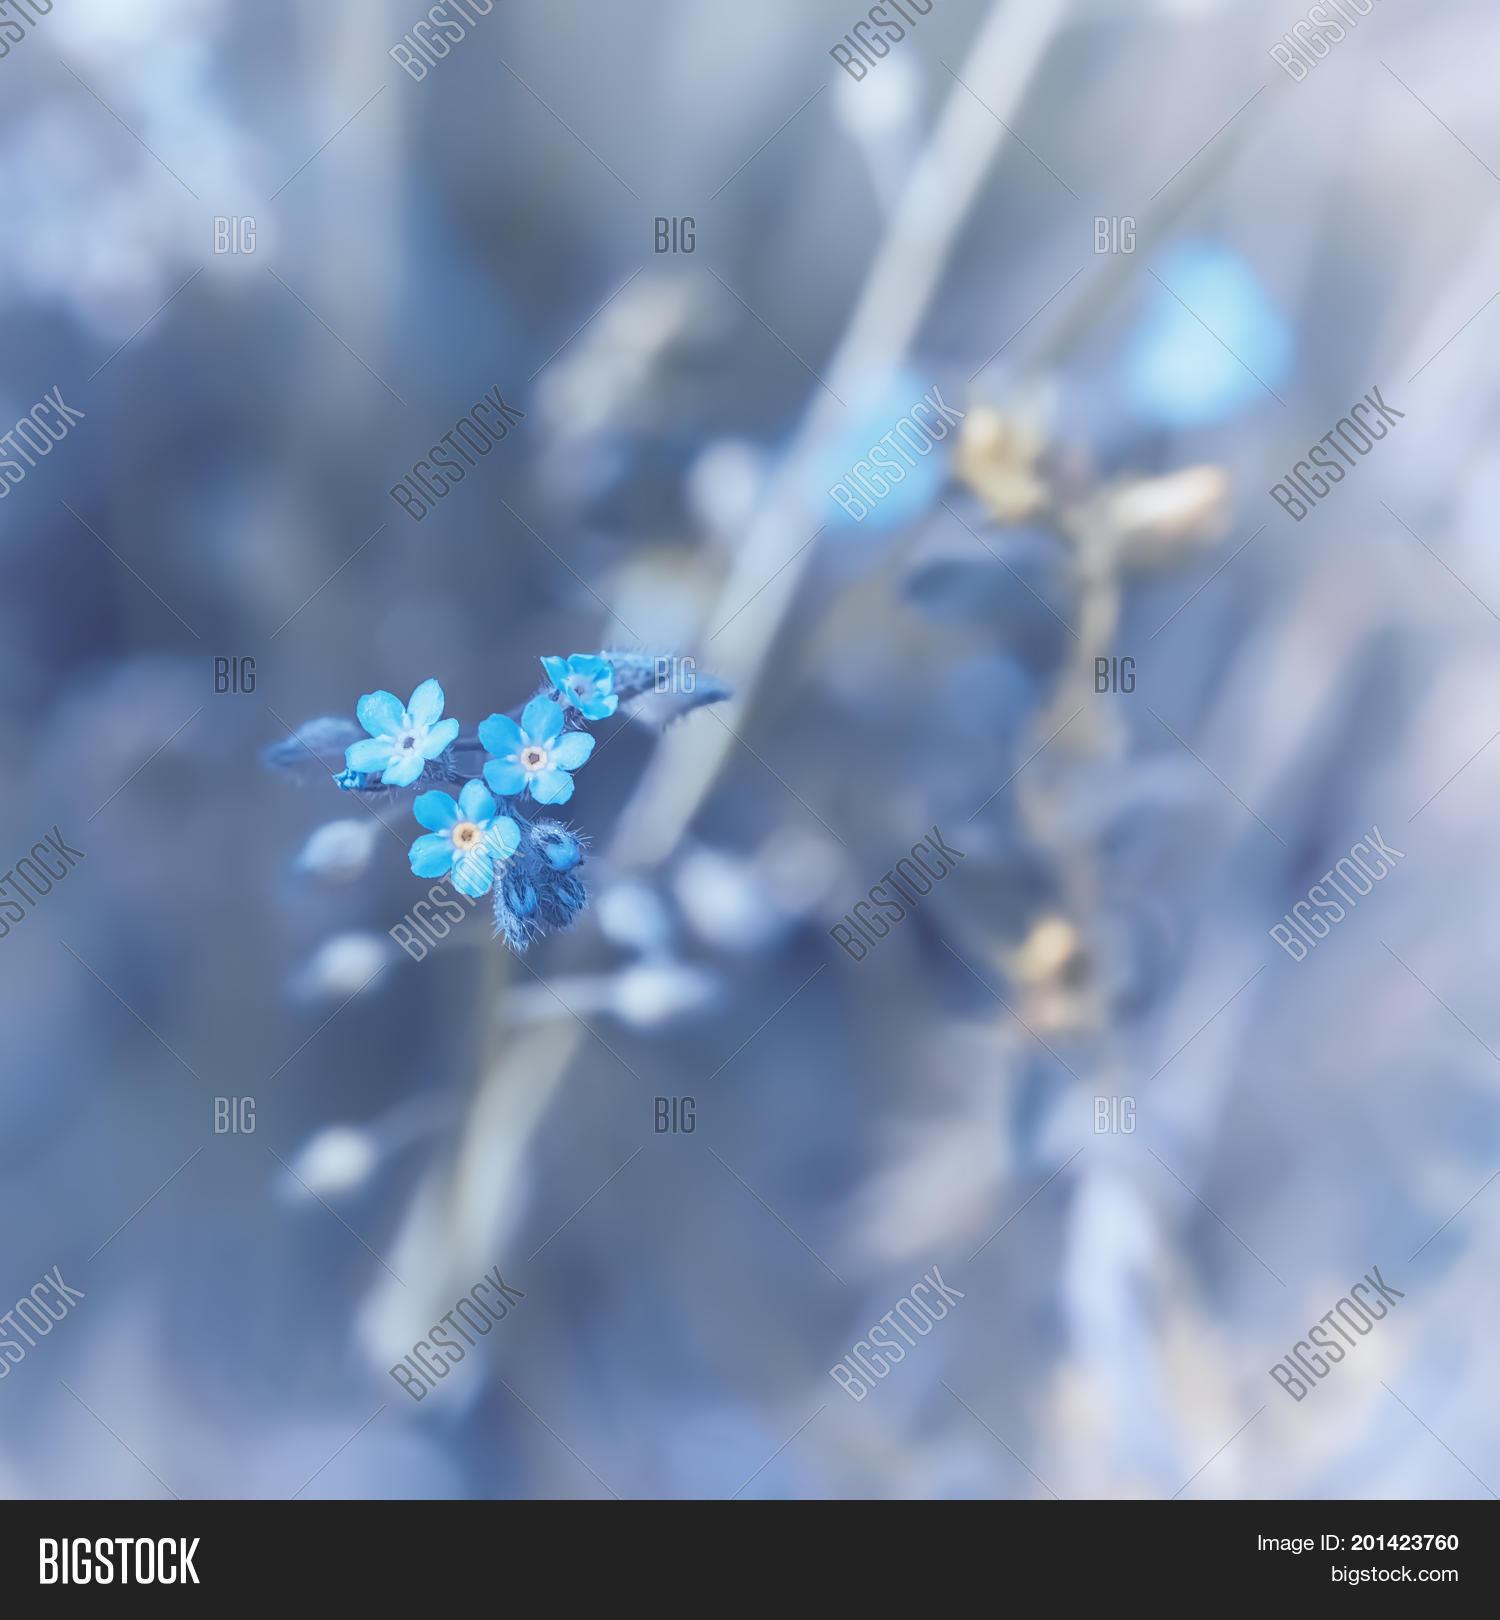 Small blue flowers image photo free trial bigstock small blue flowers closeup of a woodland forget me not myosotis sylvatica izmirmasajfo